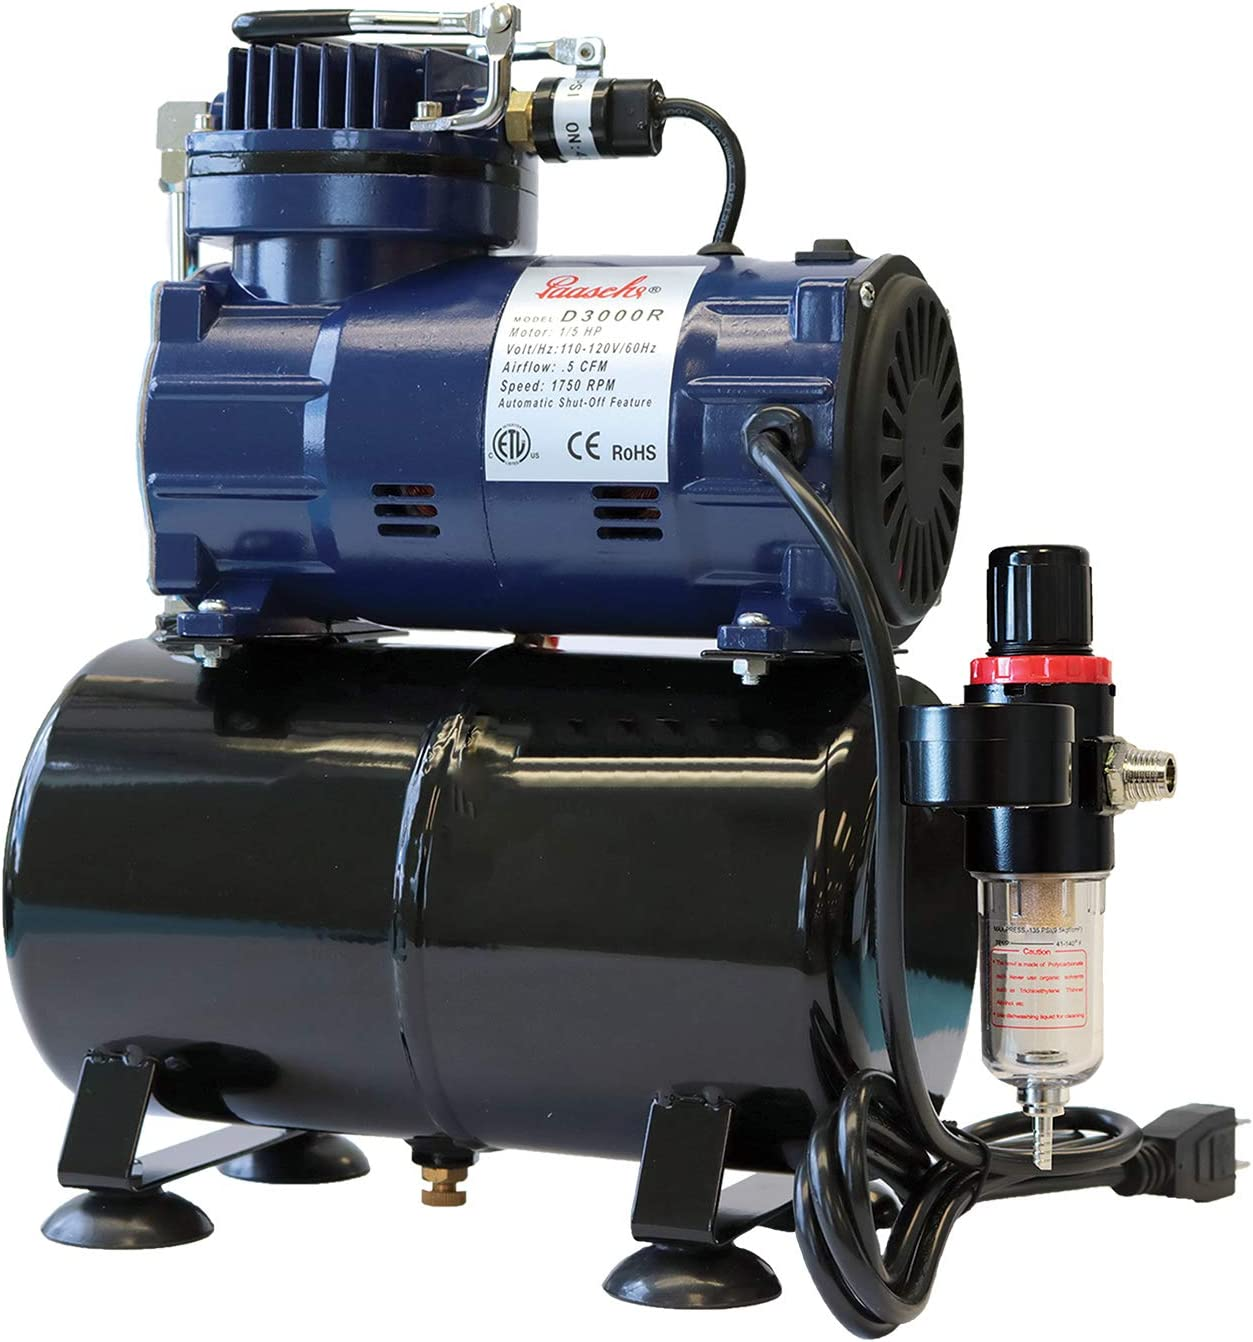 Paasche D3000R 1/5 HP Airbrush Compressor